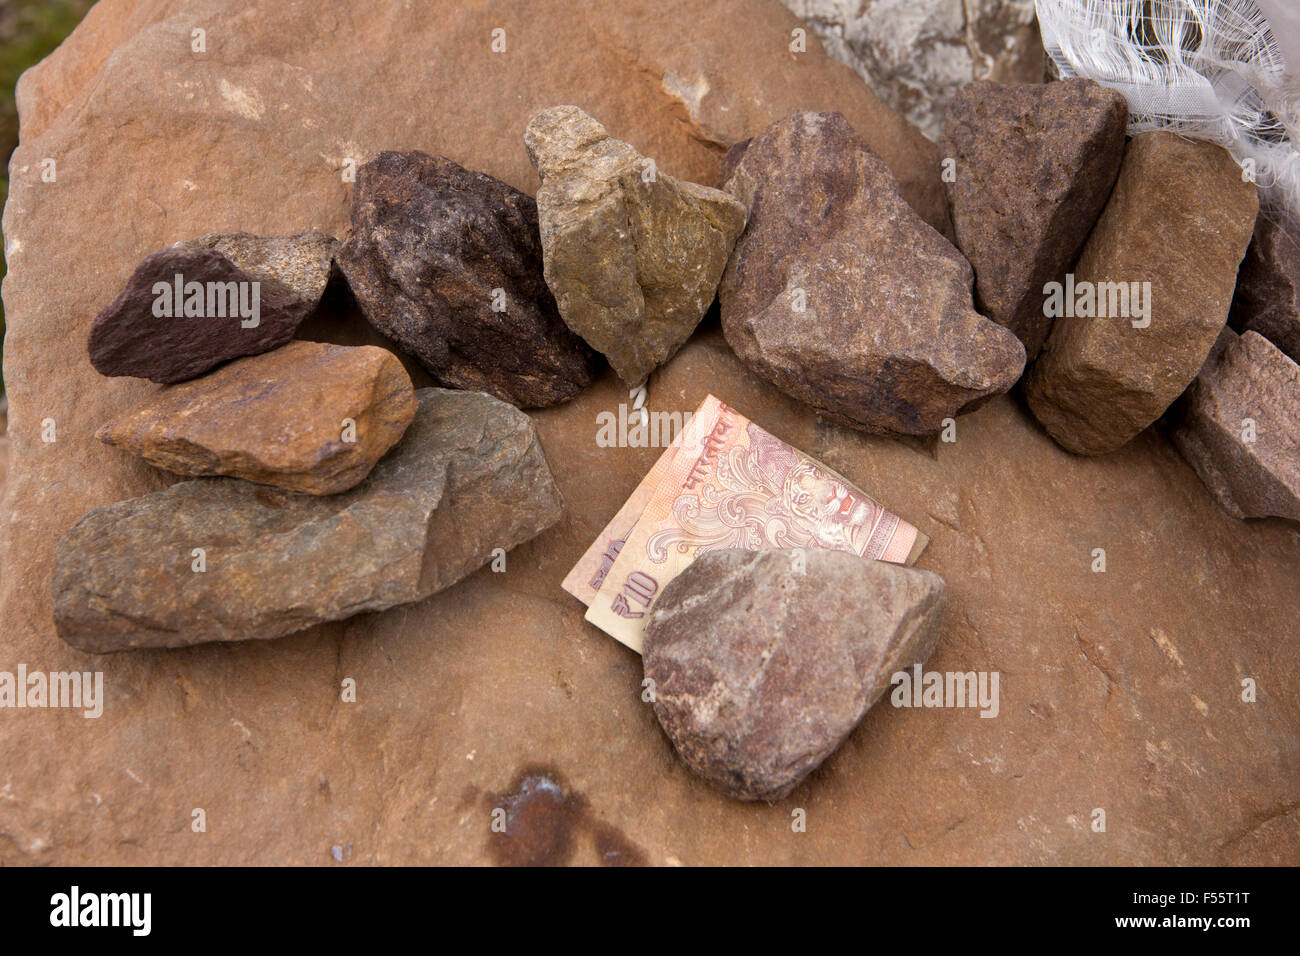 India, Himachal Pradesh, Spiti, Chandra Taal, Full Moon Lake, stones, grains of rice and 10 rupee note left as Buddhist - Stock Image